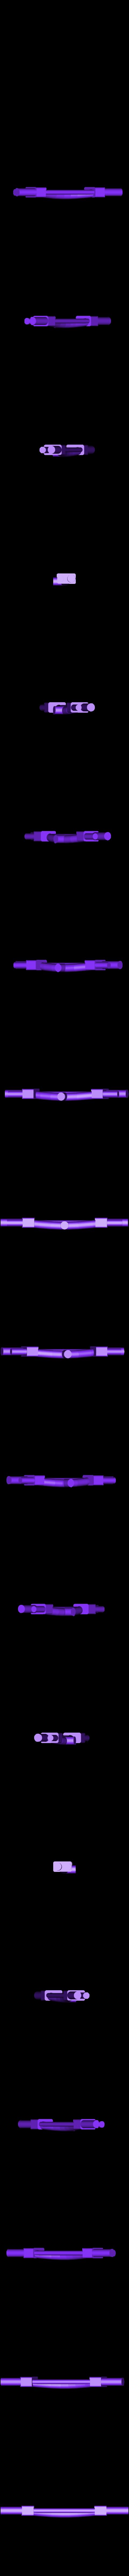 quad-stuur.stl Download free STL file quad bombardier DS 650 • 3D printer object, jasperbaudoin